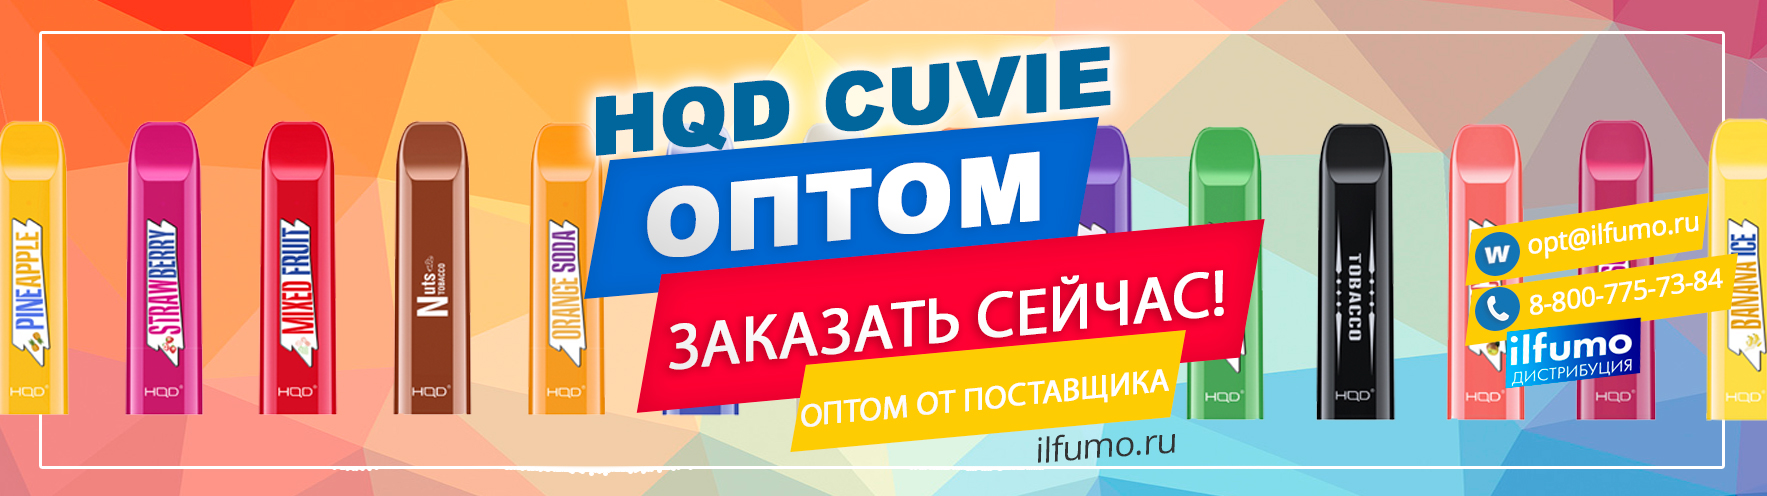 kupit optom hqd cuvie - Купить оптом одноразовые электронные сигареты HQD